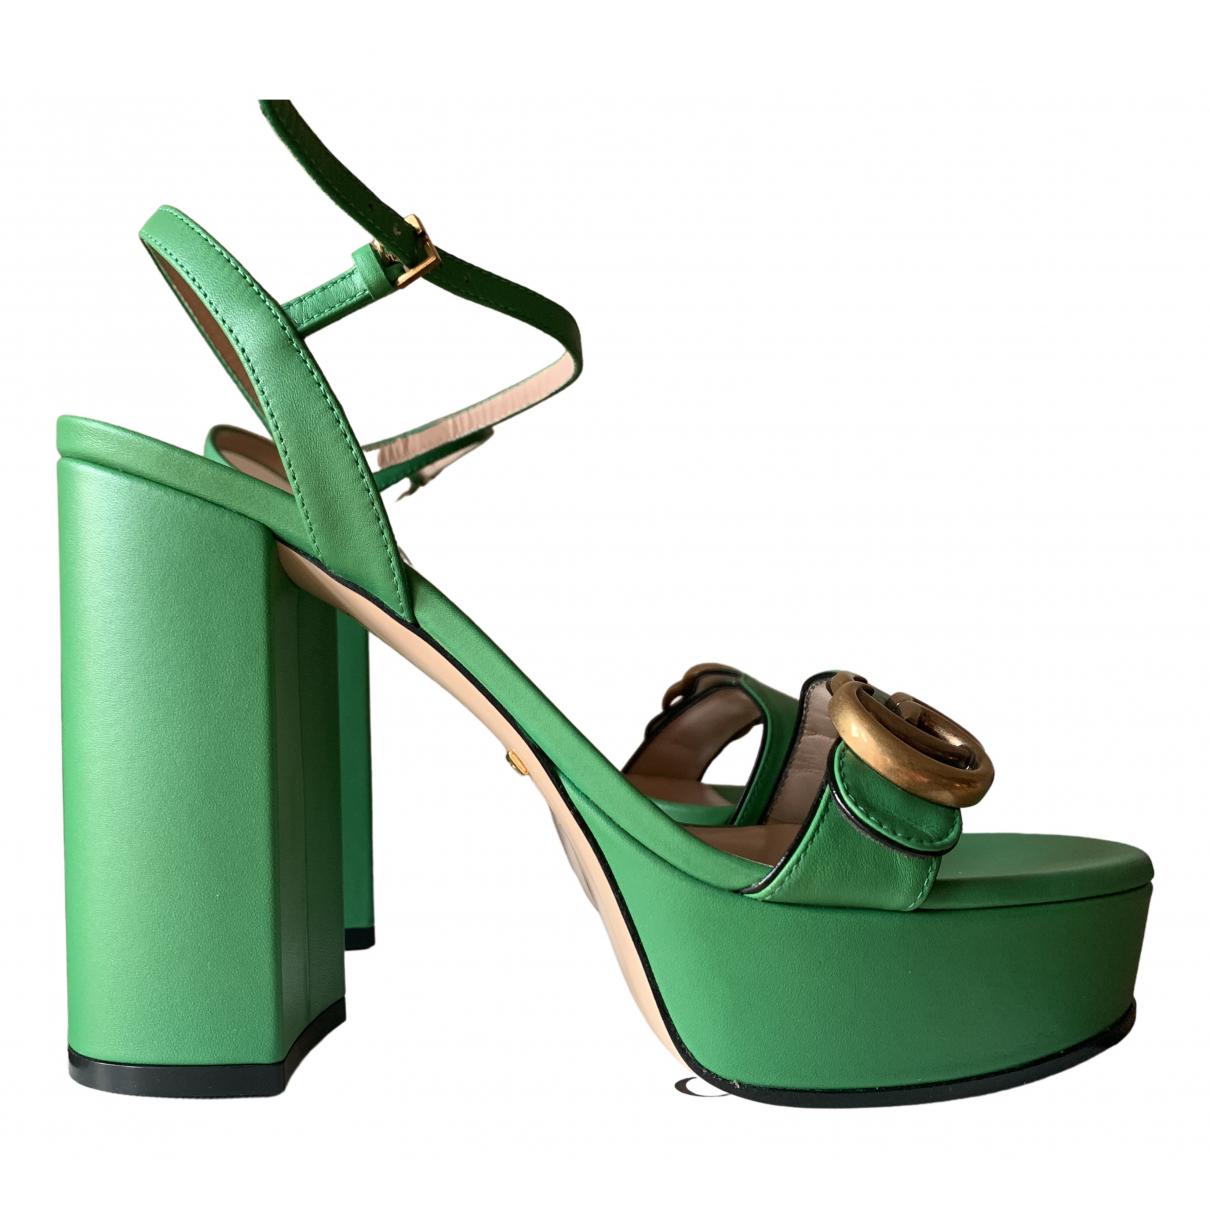 Gucci Marmont Sandalen in  Gruen Leder